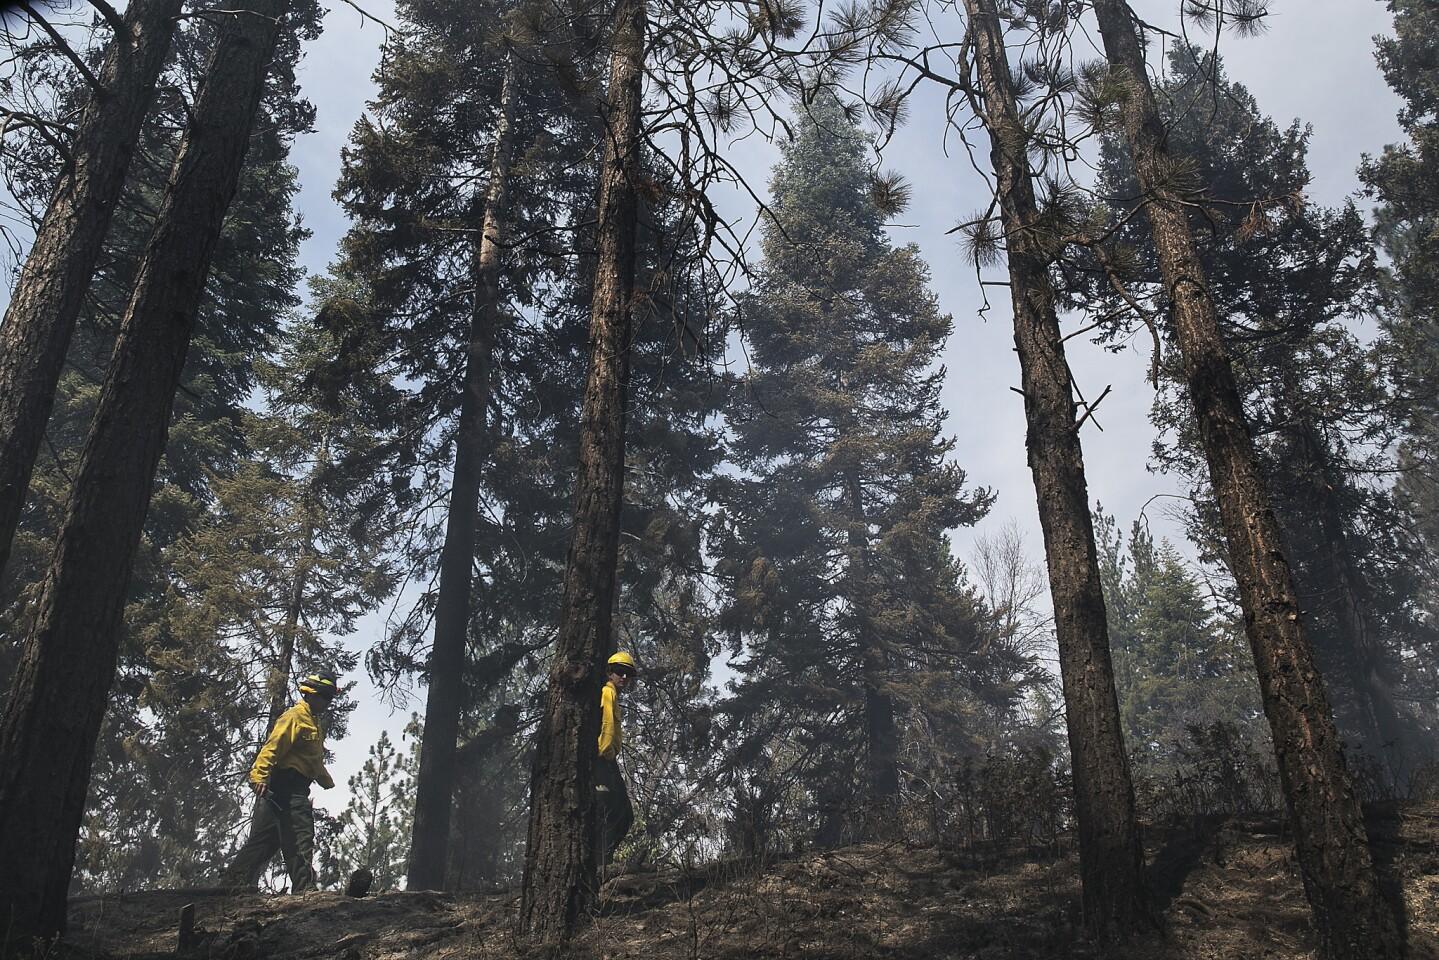 Dryer season expected in Yosemite